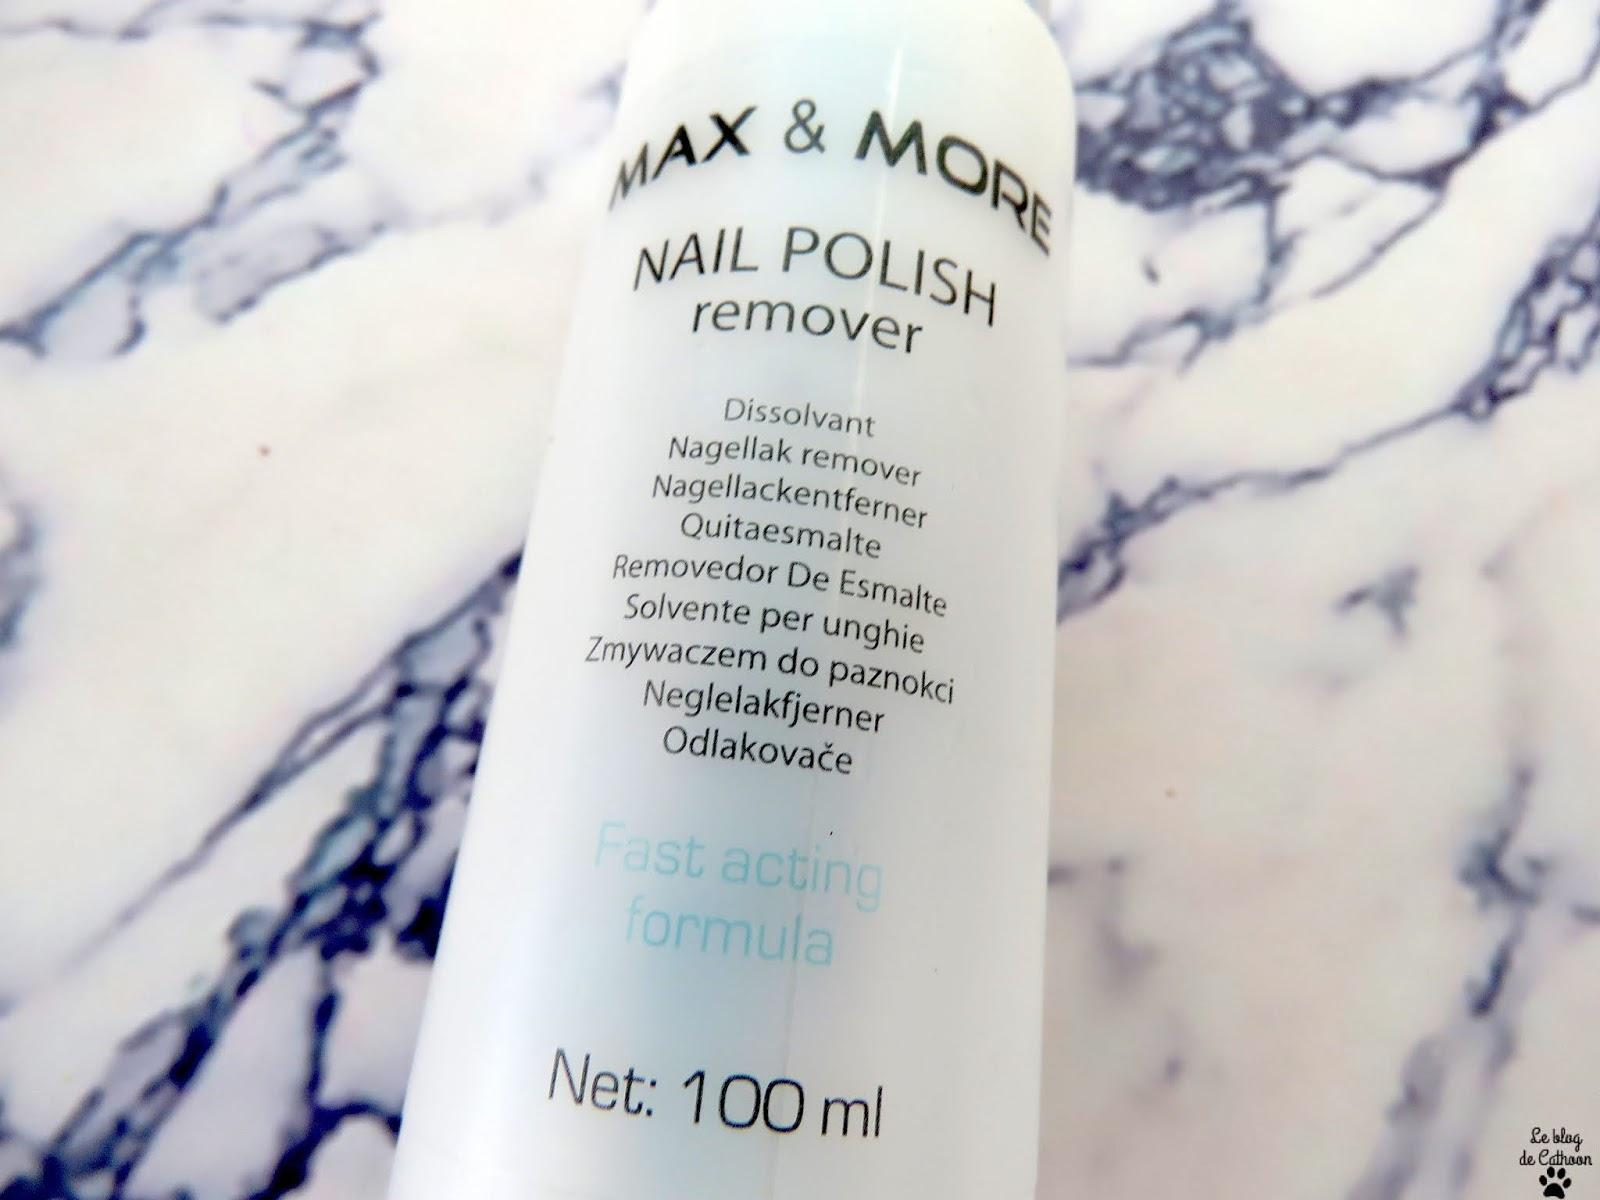 Nail Polish Remover - Dissolvant - Max & More